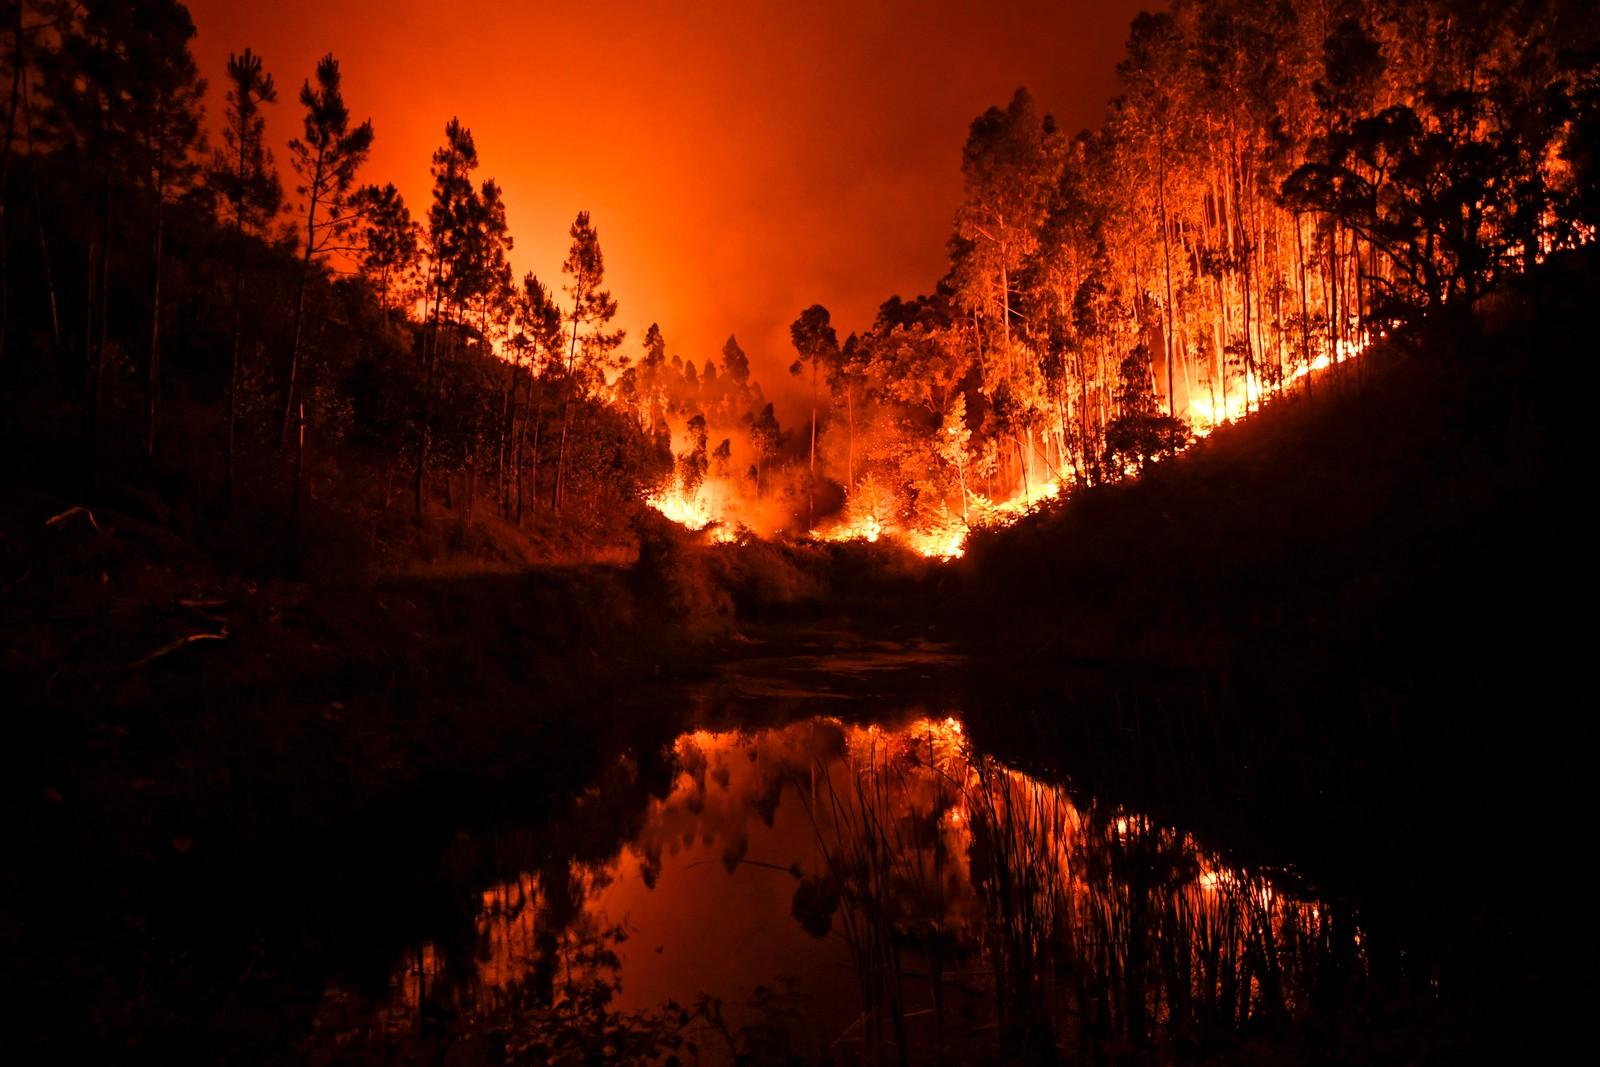 Et stort område som brenner ved Penela i sentrale Portugal.